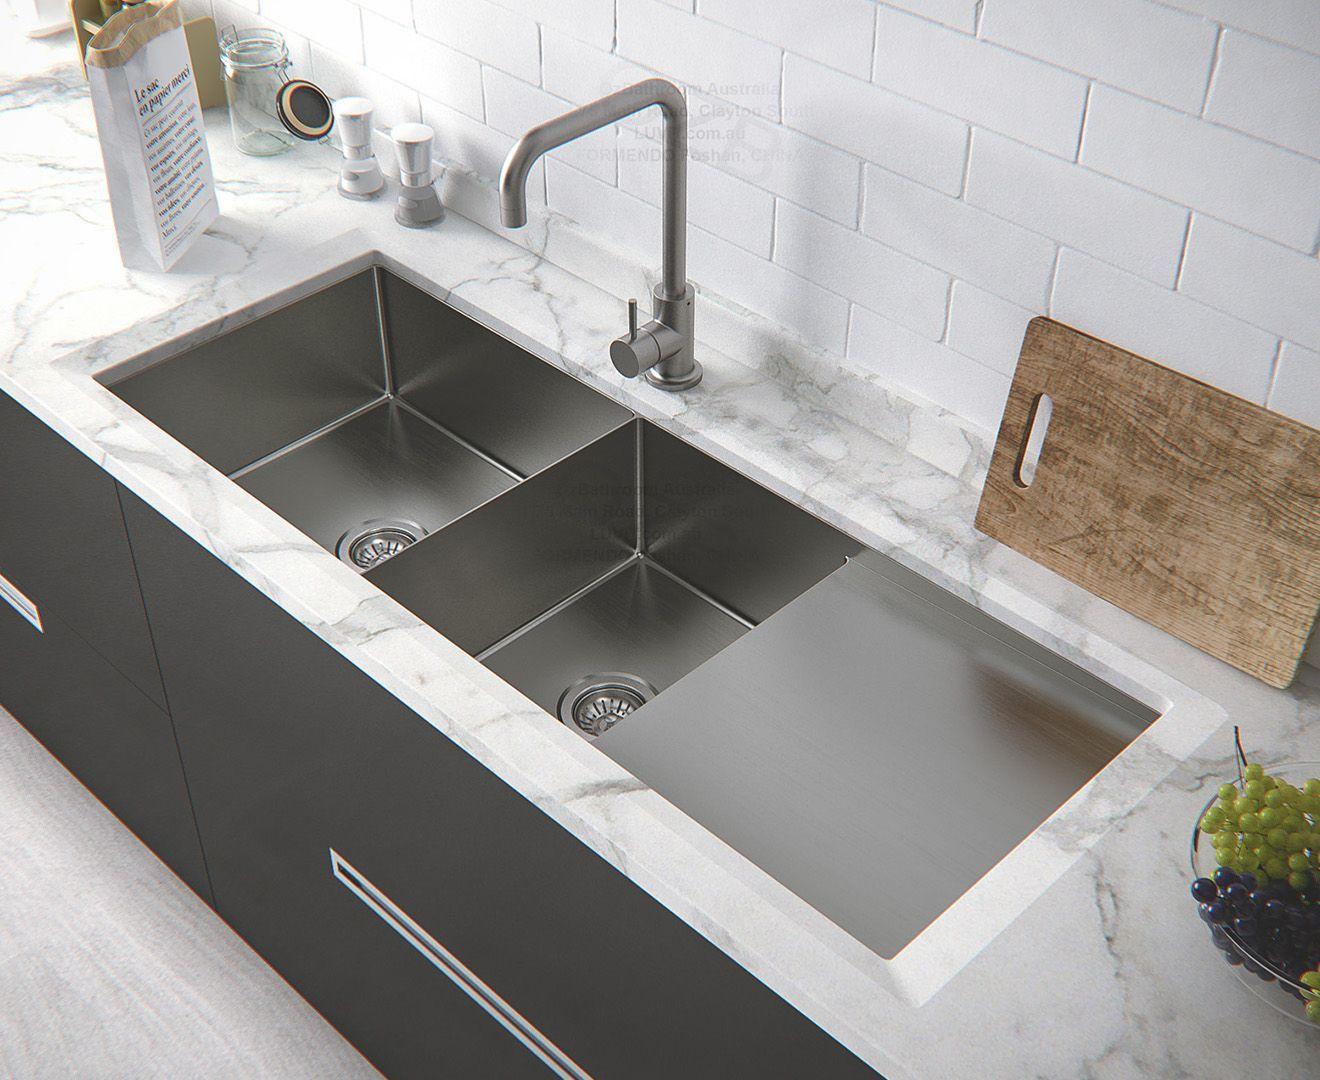 Fluso 120x45cm Double Bowl Kitchen Sink Drainer Board Doublekitchensink Kitchen Sink Design Double Bowl Kitchen Sink Best Kitchen Sinks